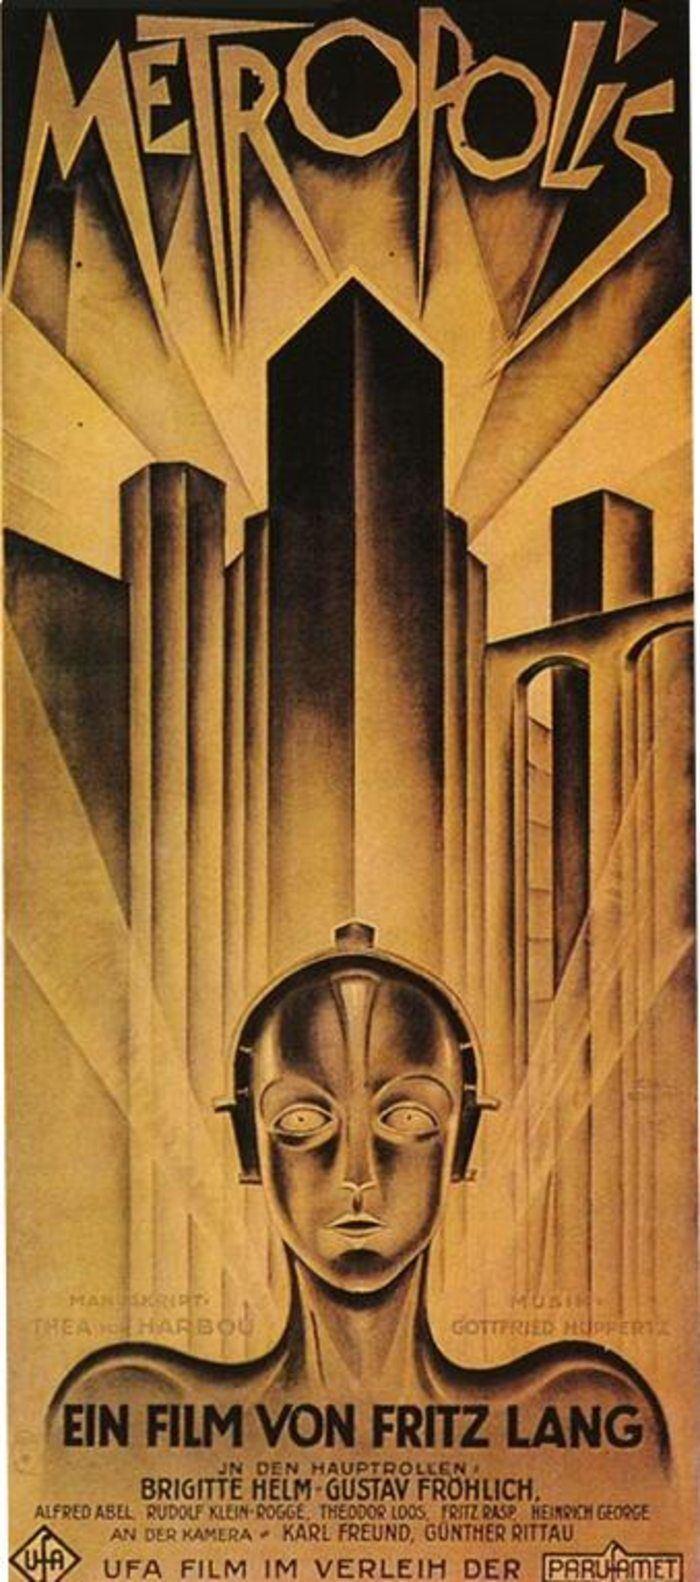 Metropolis, Filmed in 1927